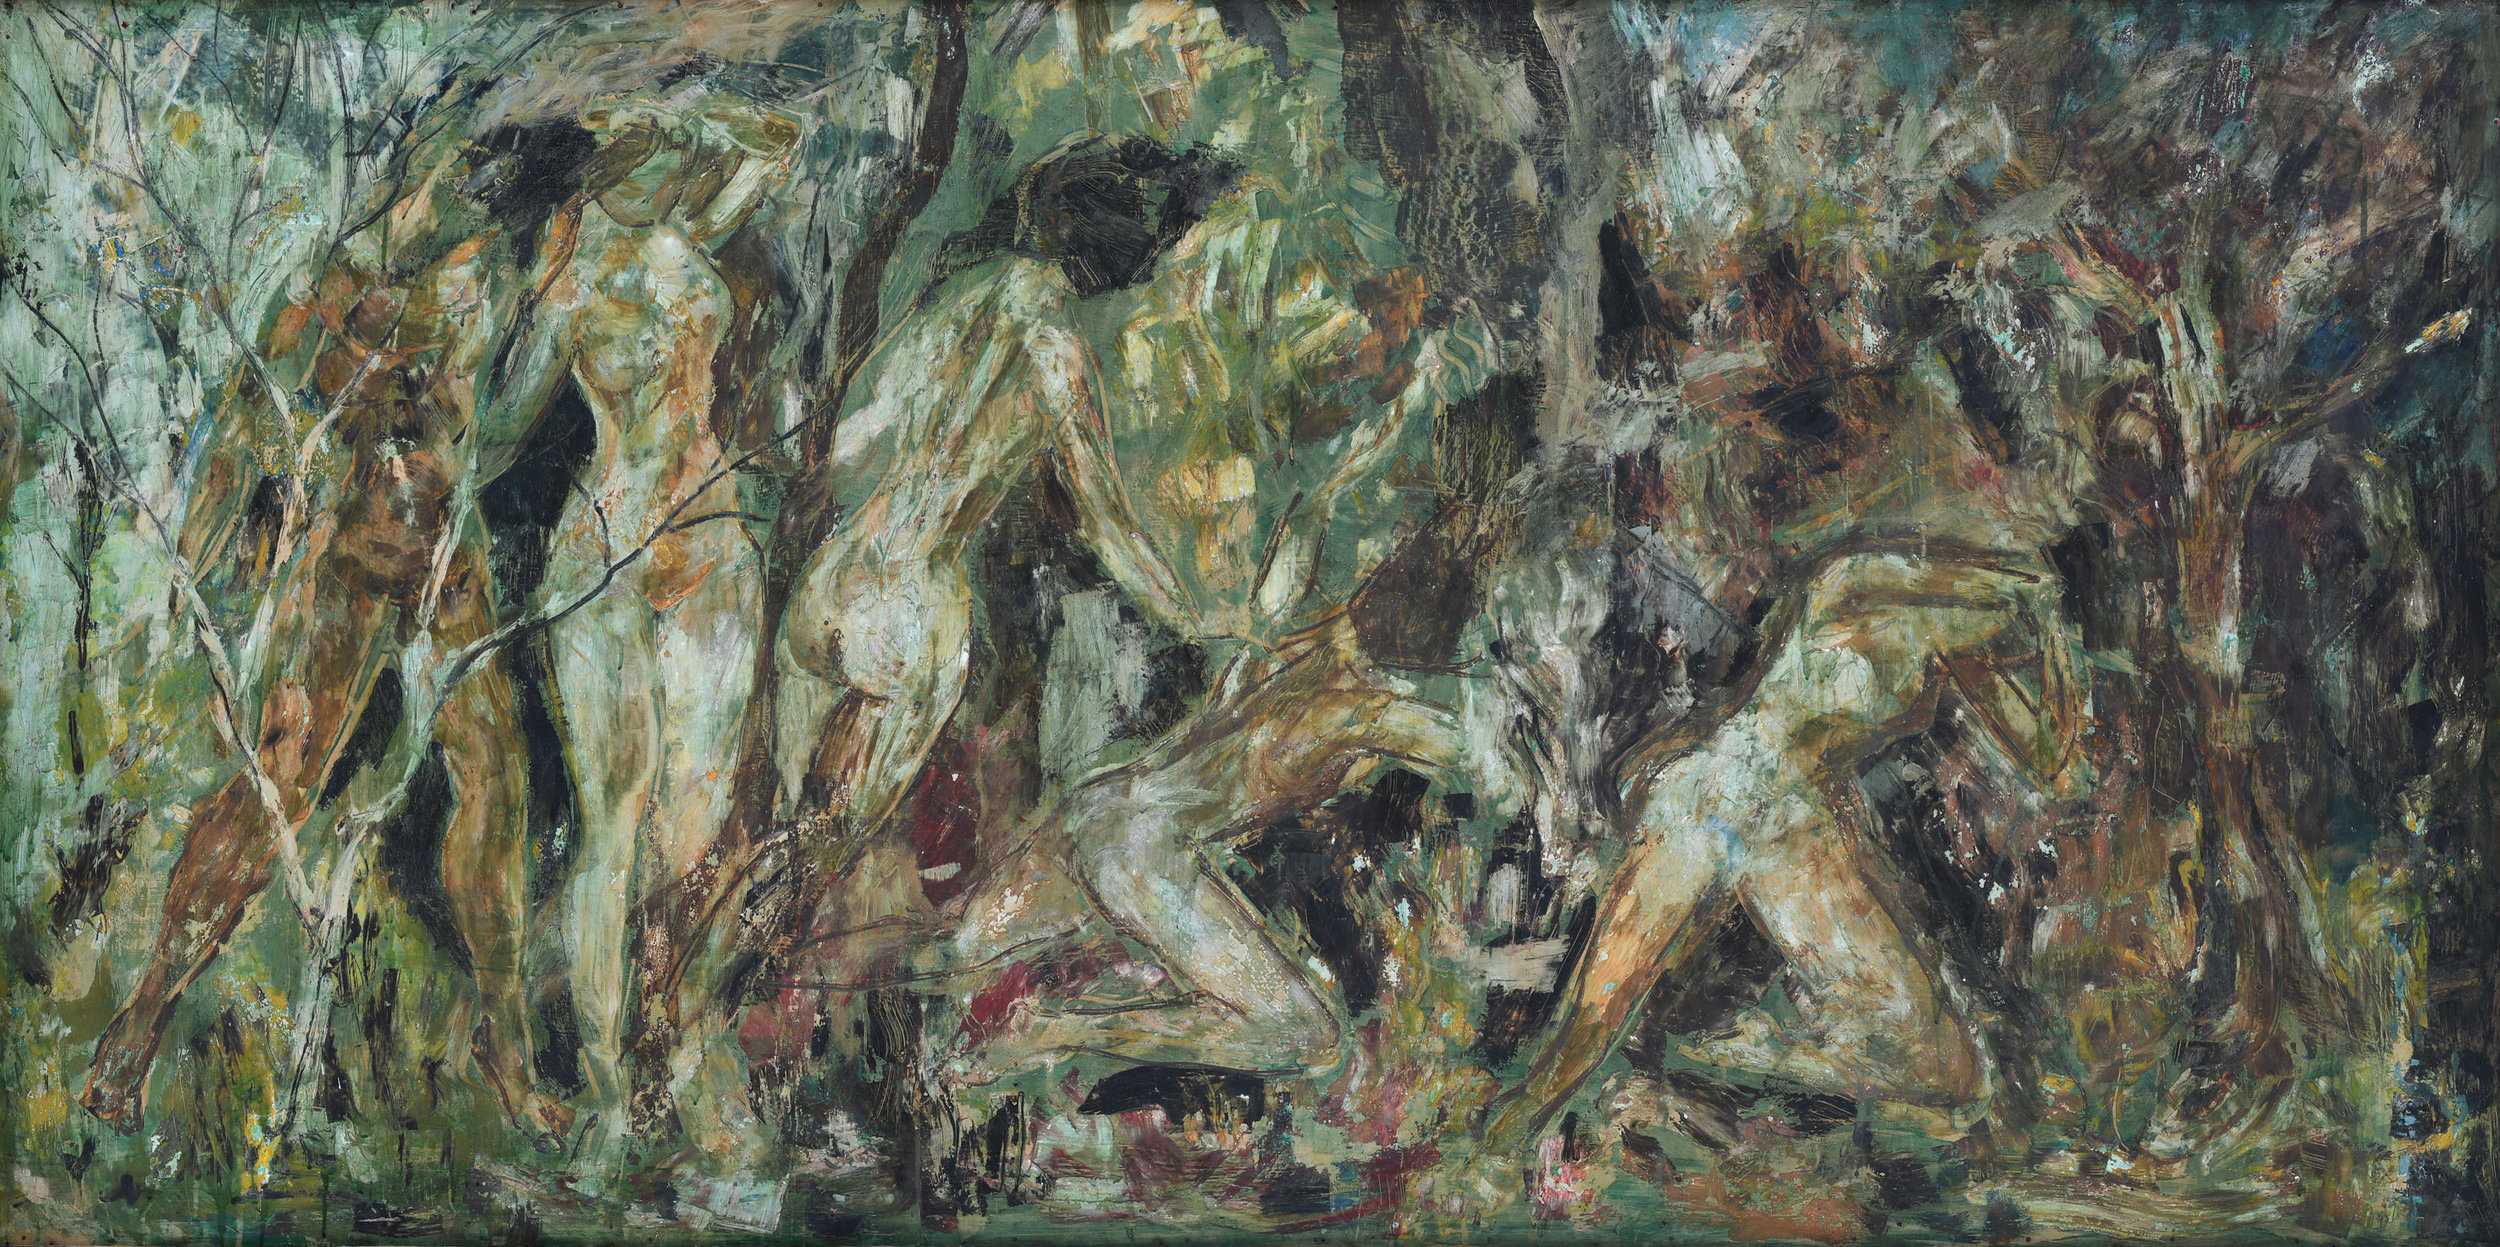 Vincent Hoisington, 'The Expulsion from Eden', 1964, oil on board, 130 x 240cm. Image courtesy of Art Agenda, S.E.A.